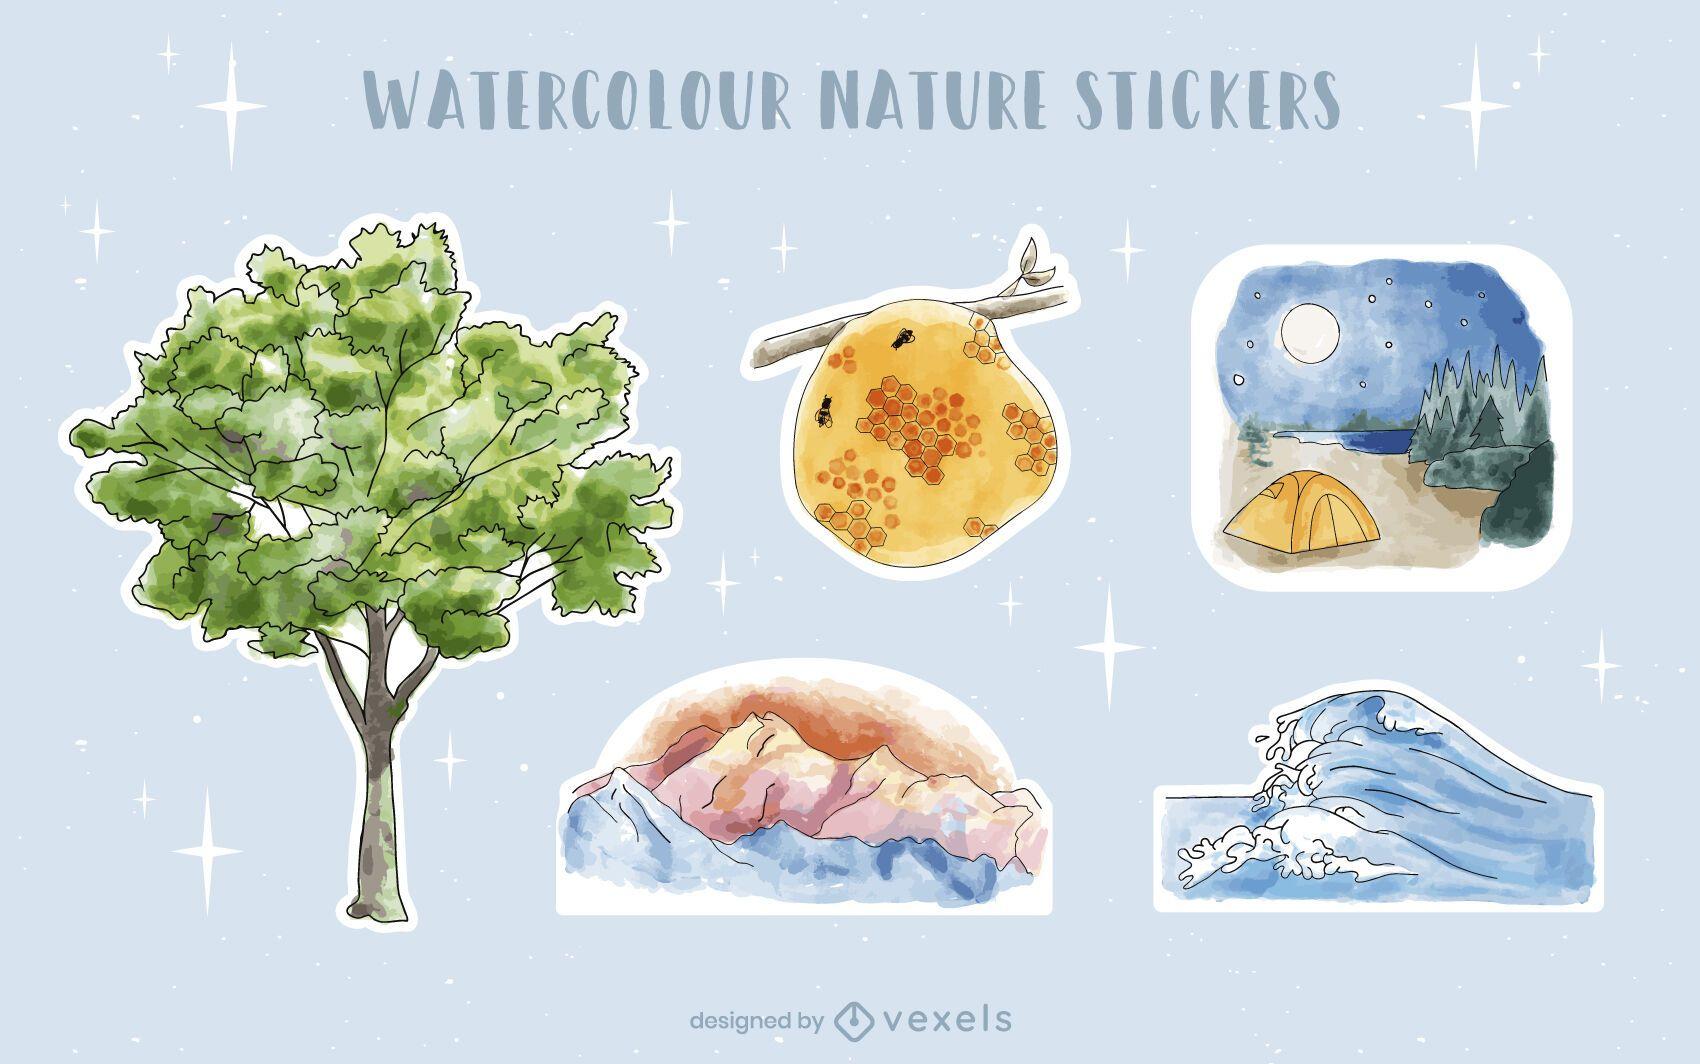 Watercolor nature sticker set